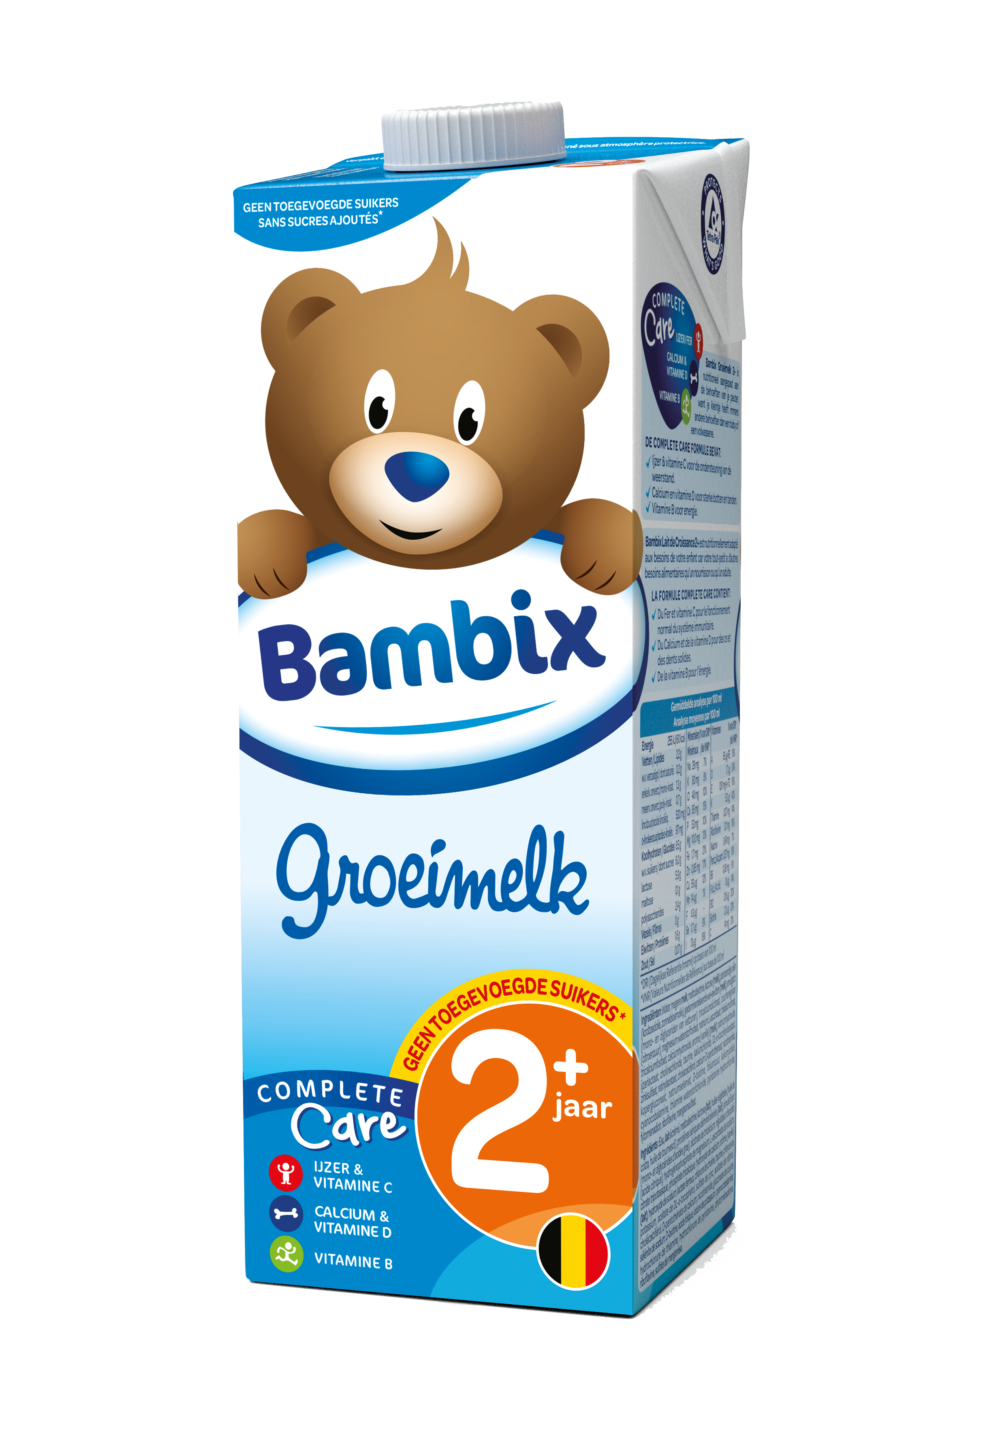 Bambix groeimelk 2+